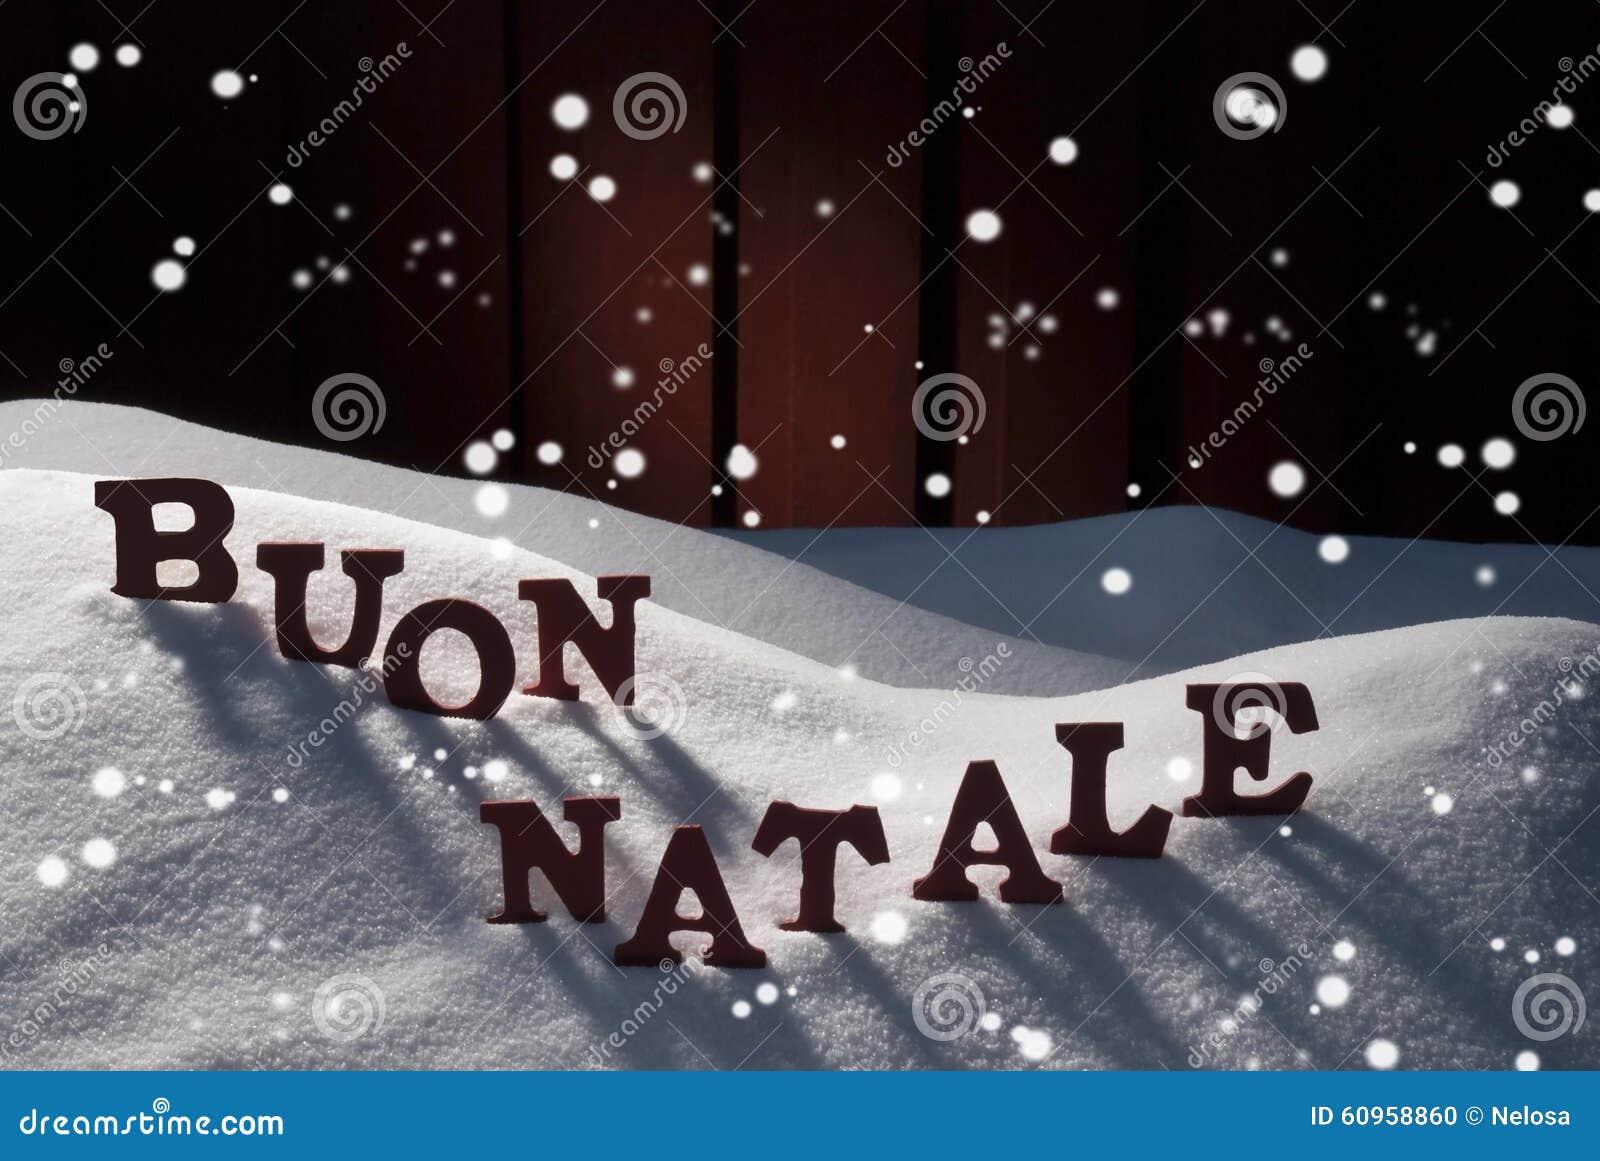 Karte WithSnow, Buon Natale Means Merry Christmas, Schneeflocken ...